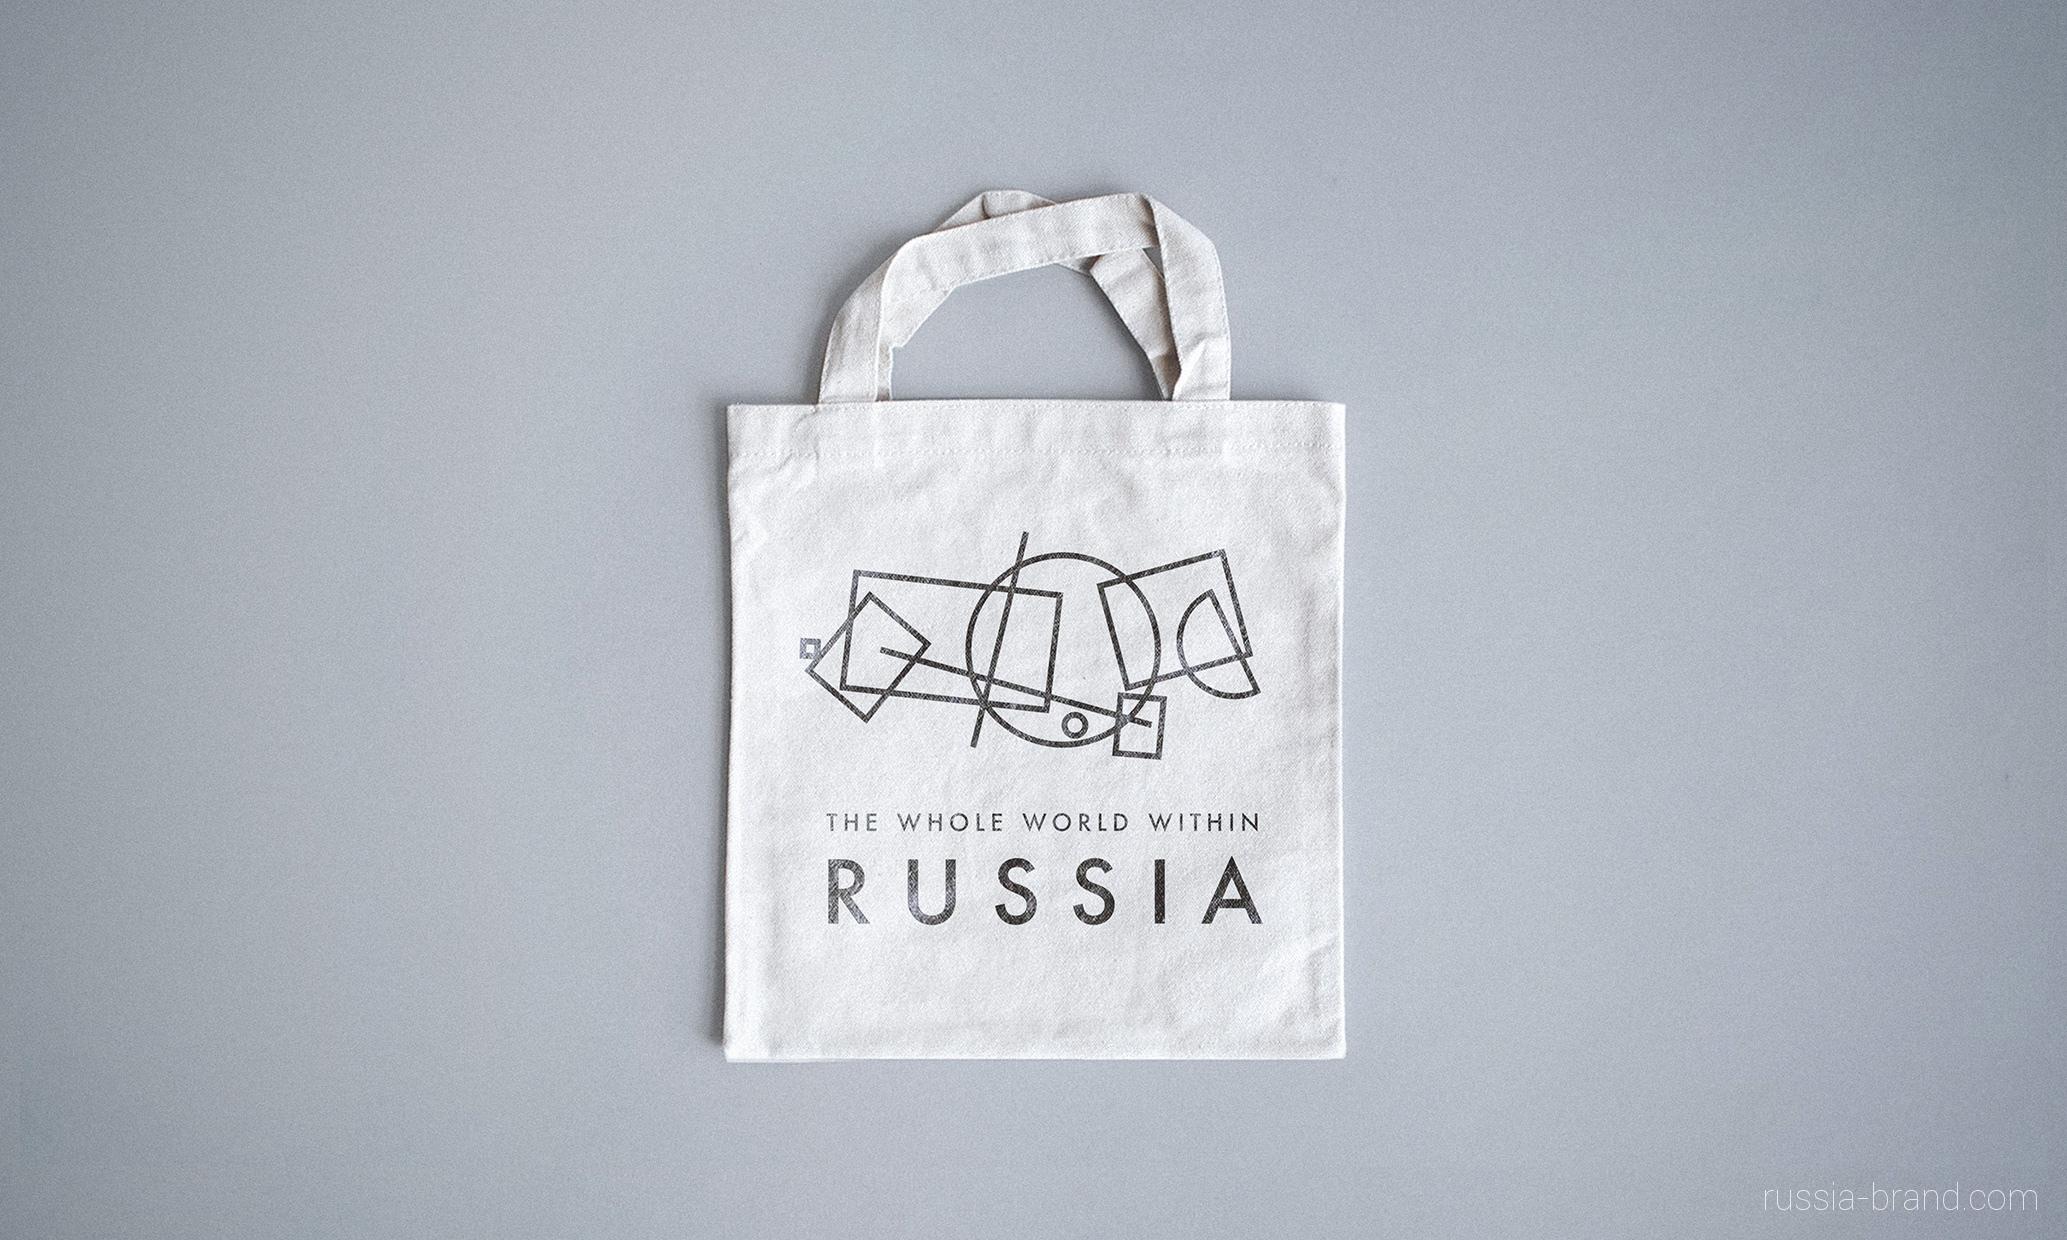 russia-brand-a91.jpg